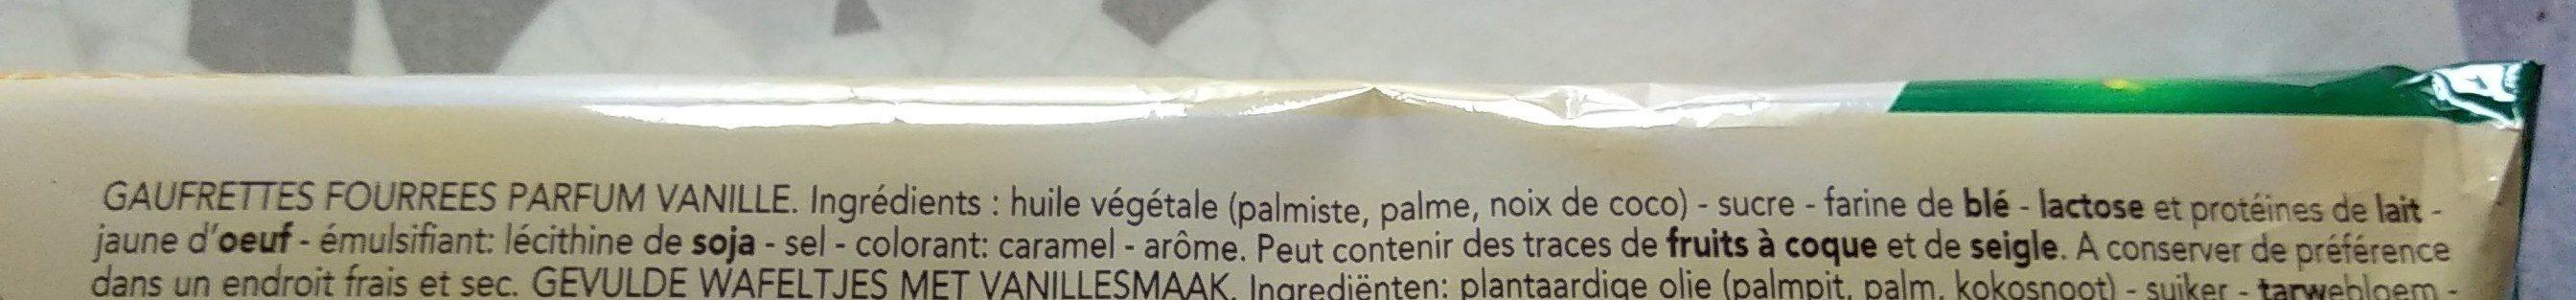 Croustrifondante Vanille - Ingrediënten